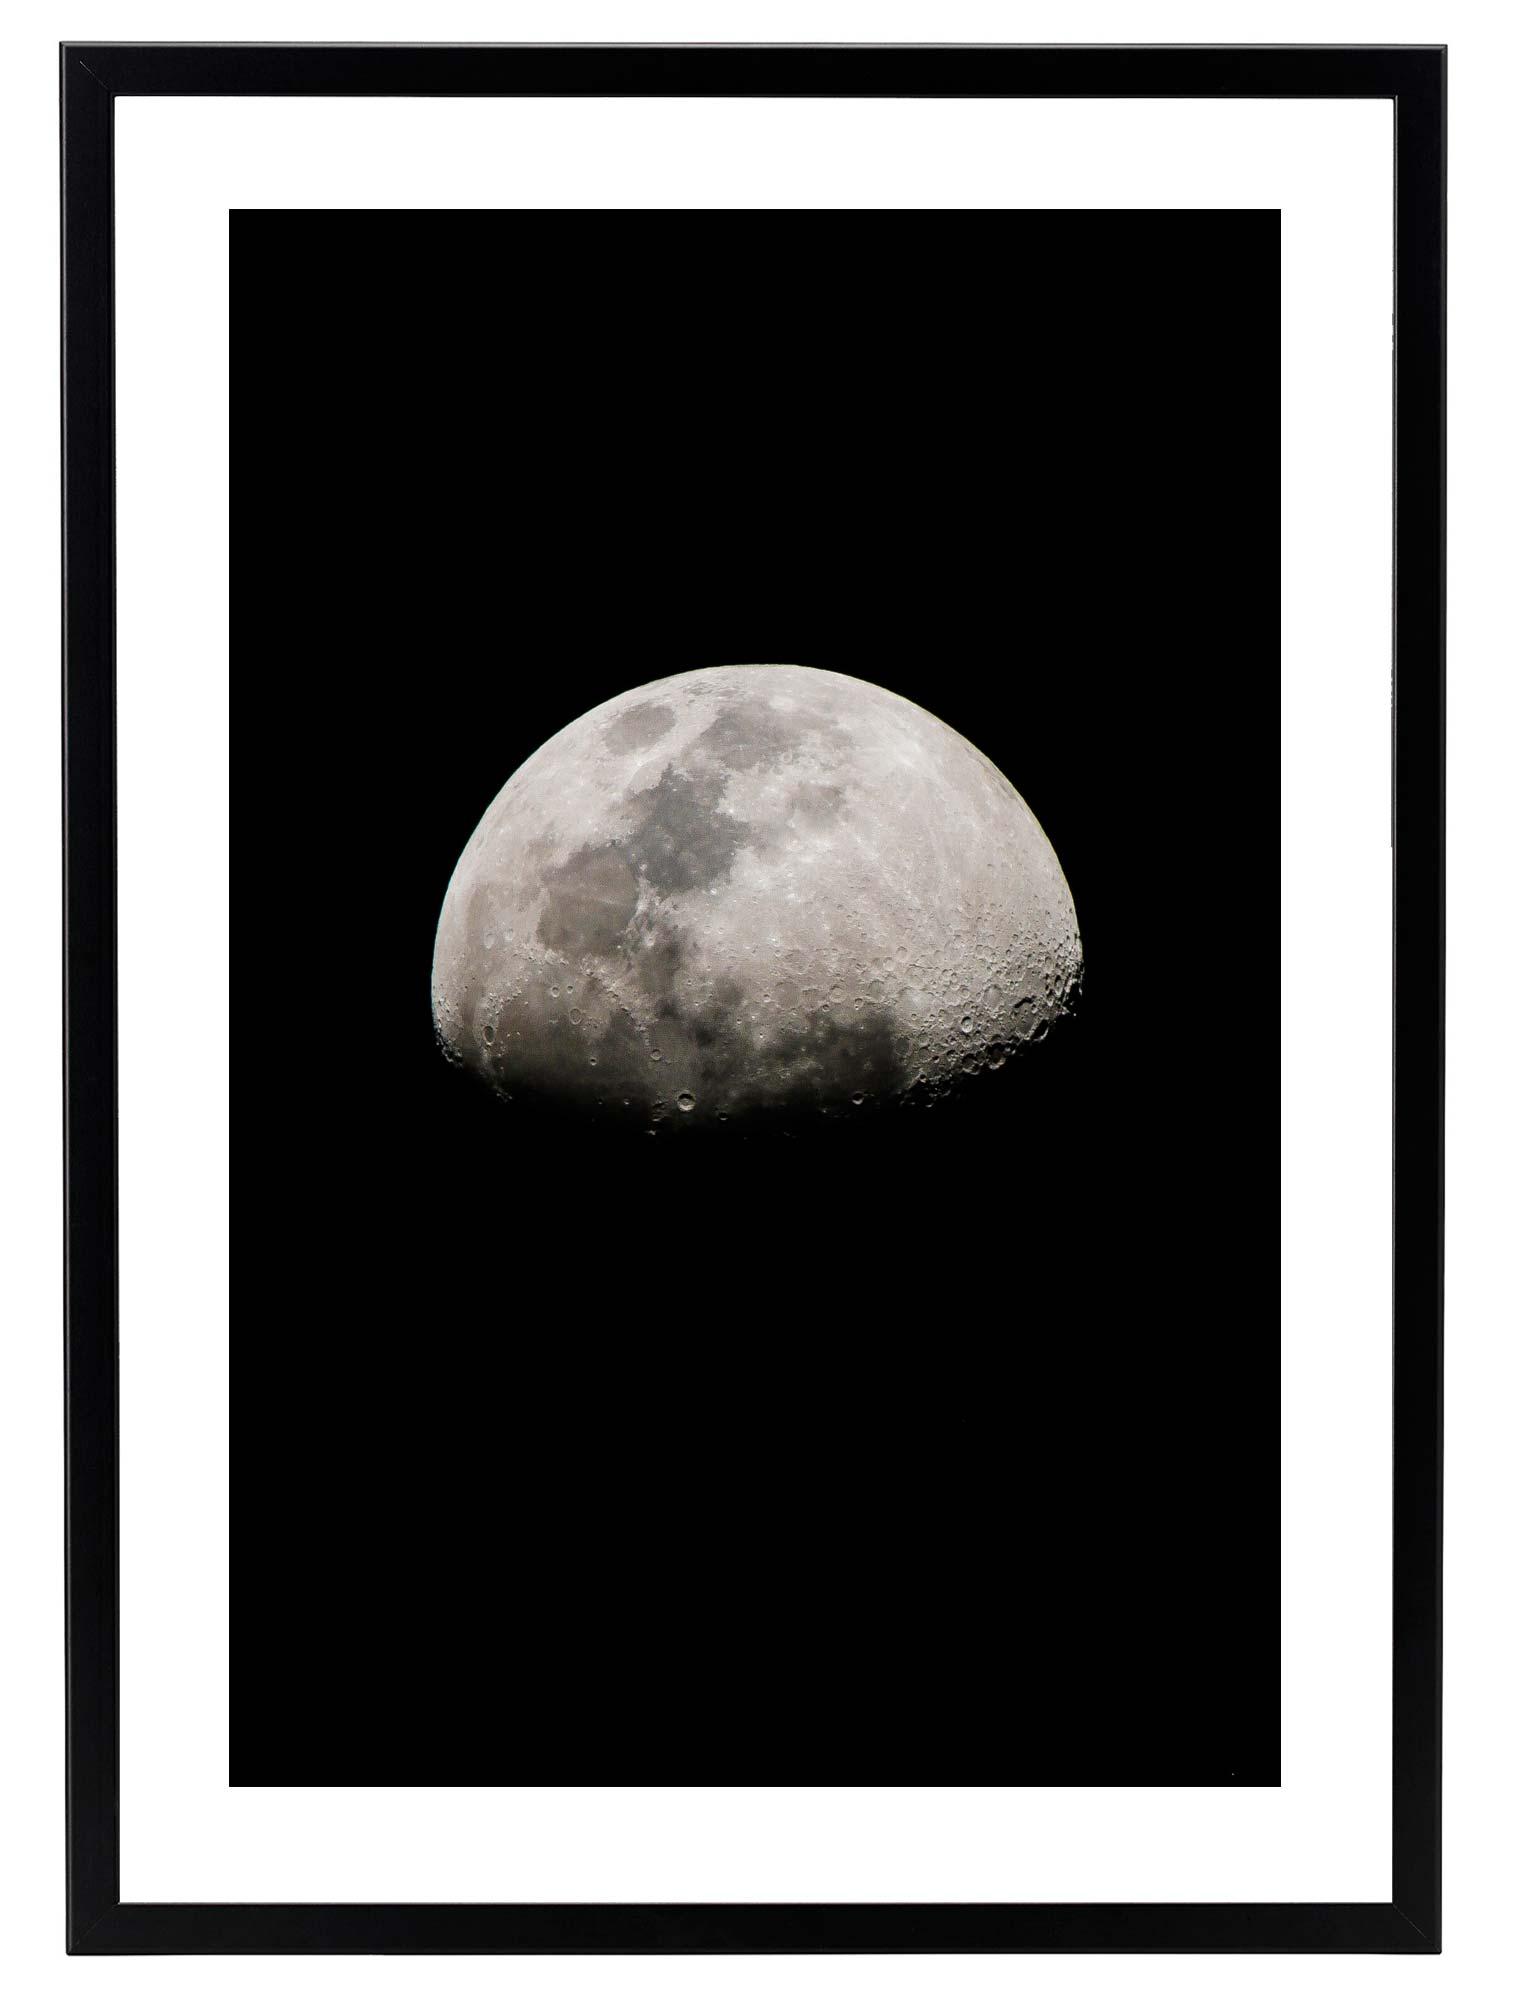 Composición Láminas Nocturnas | Wasabi Project